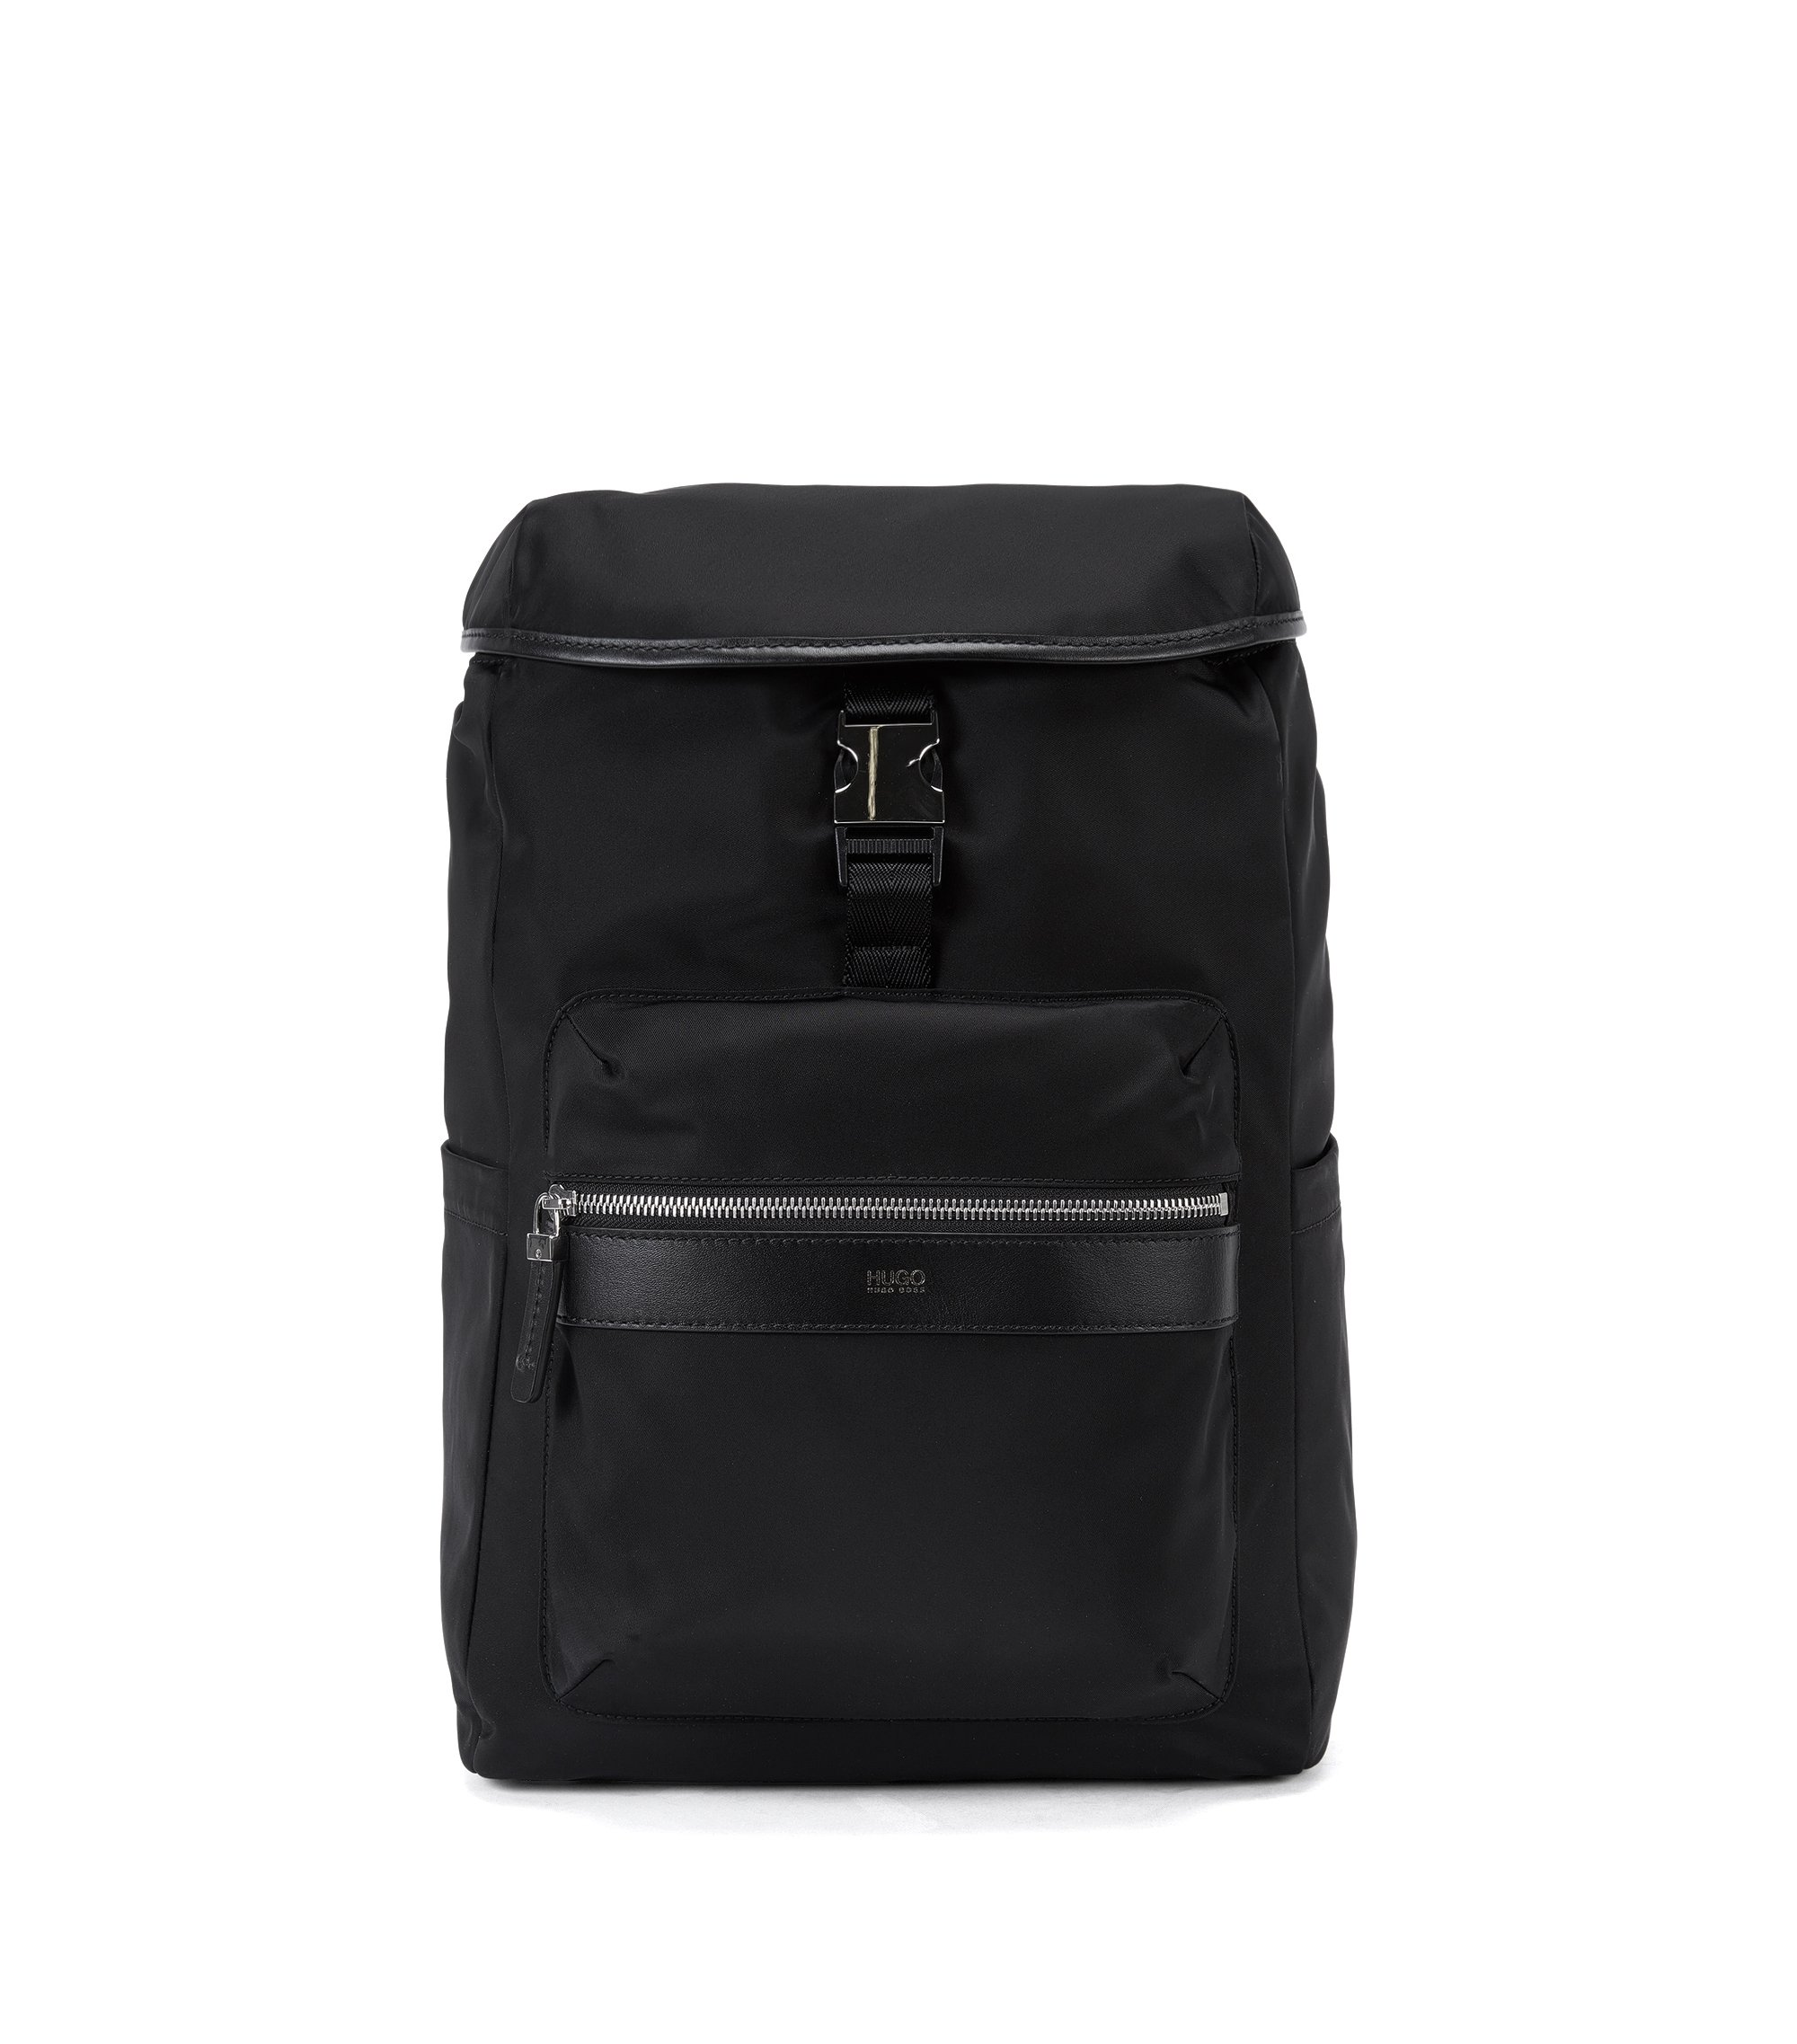 Nylon Rucksack   Digital L Backp, Black